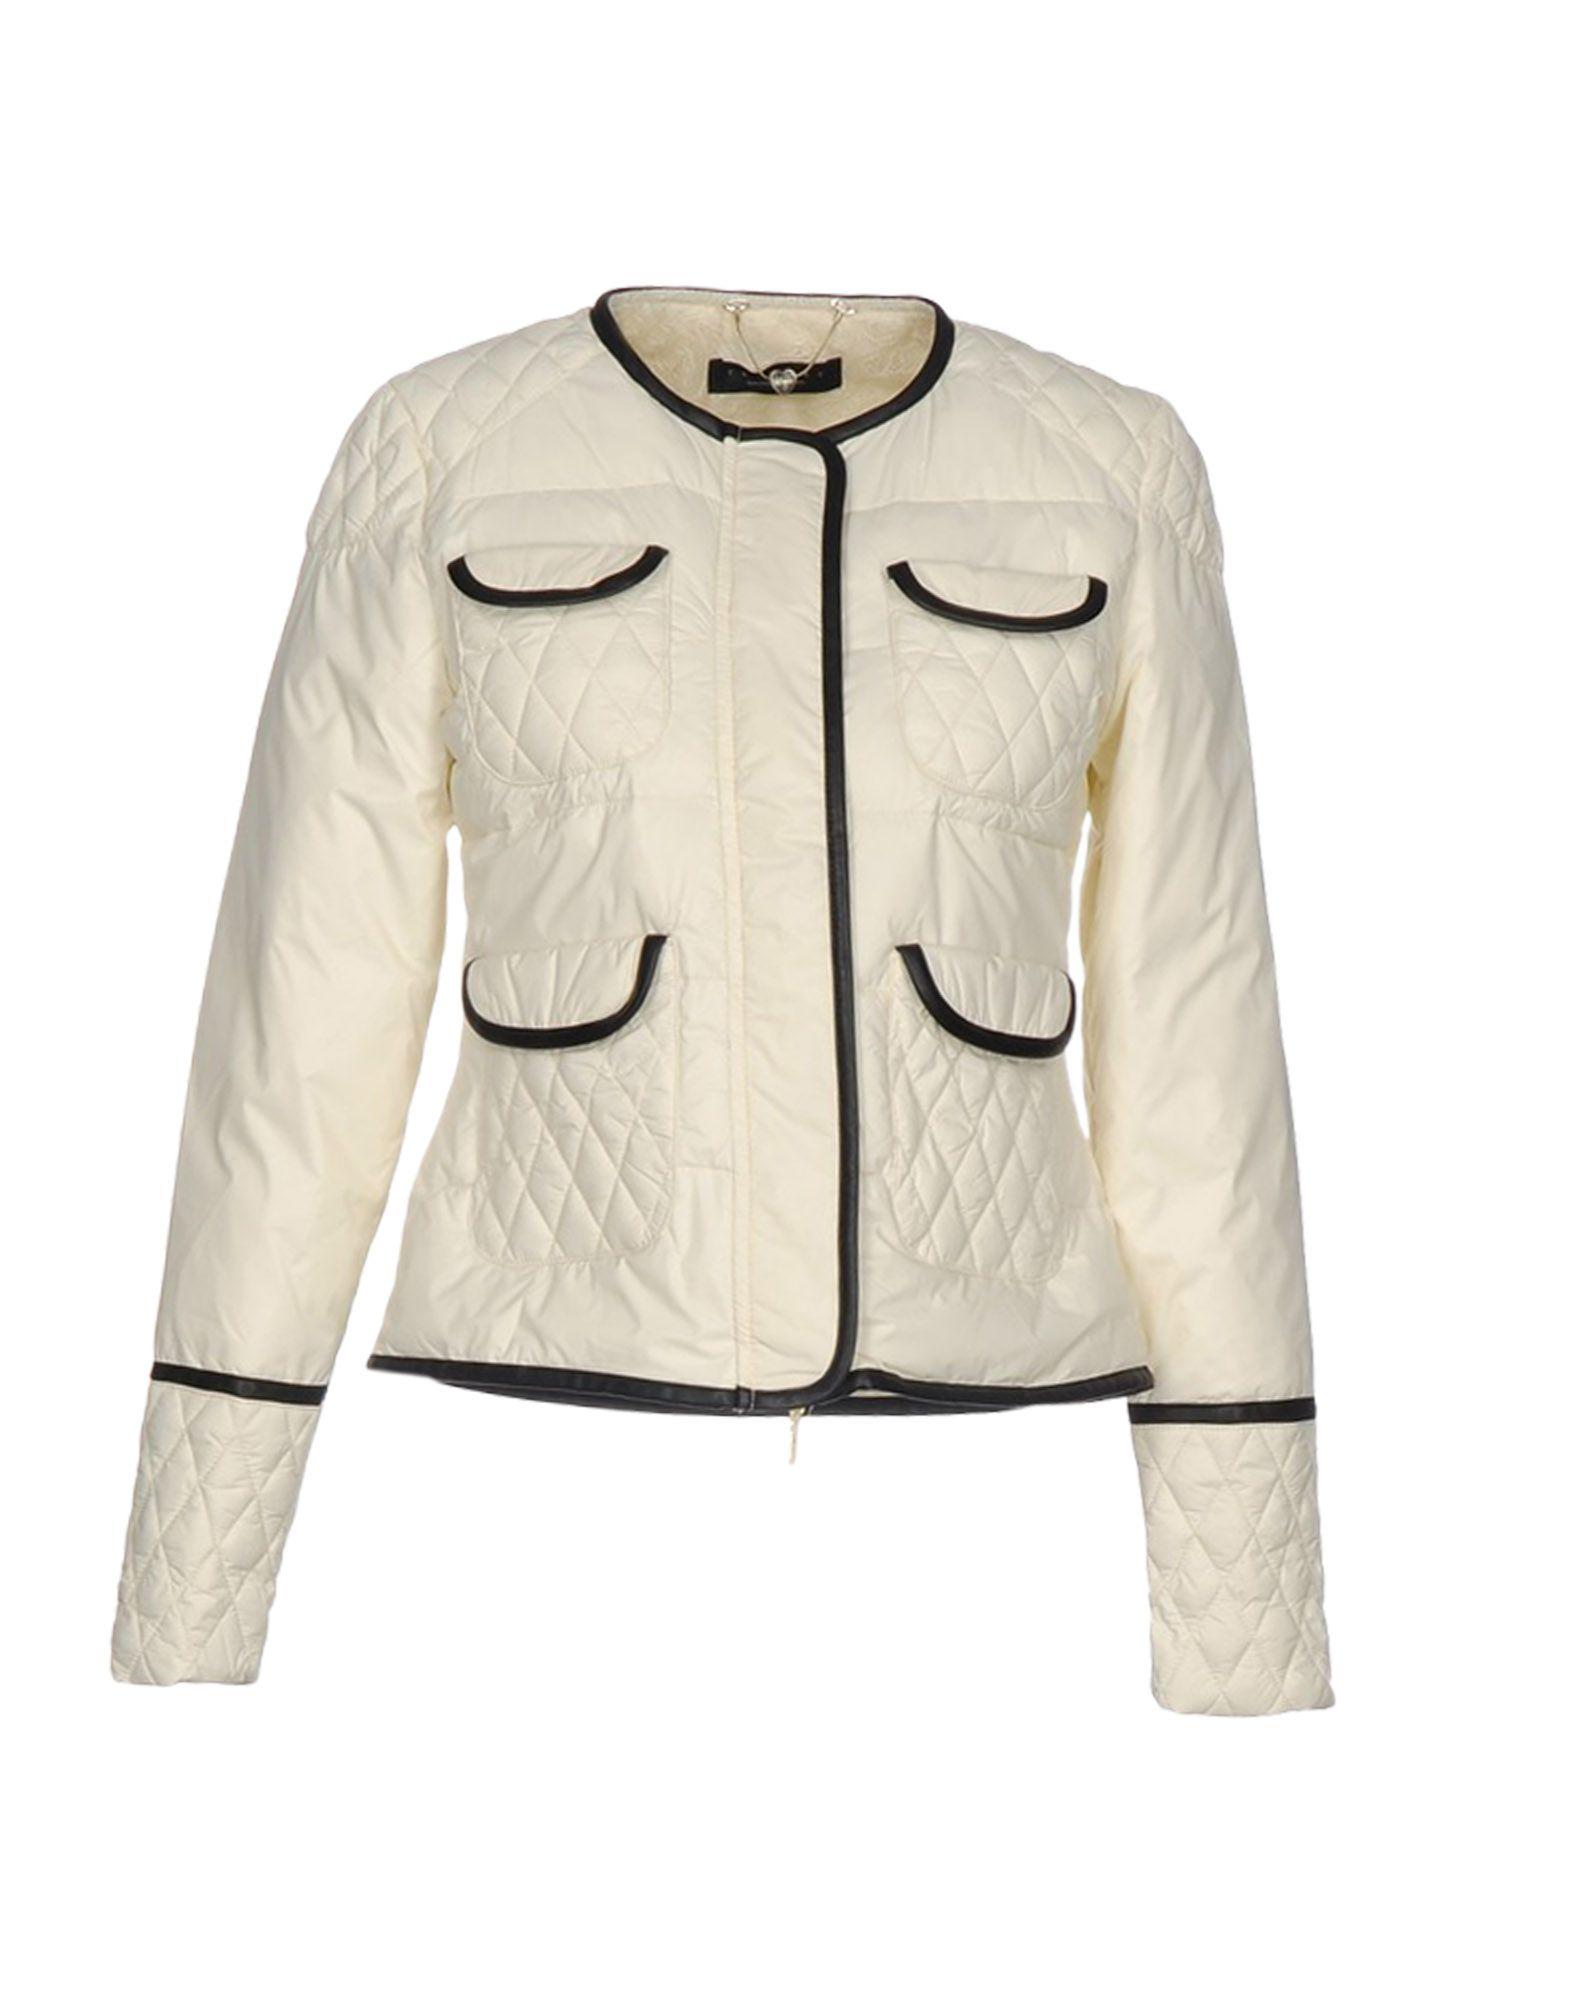 TWIN-SET Simona Barbieri Damen Jacke Farbe Elfenbein Größe 3 - broschei